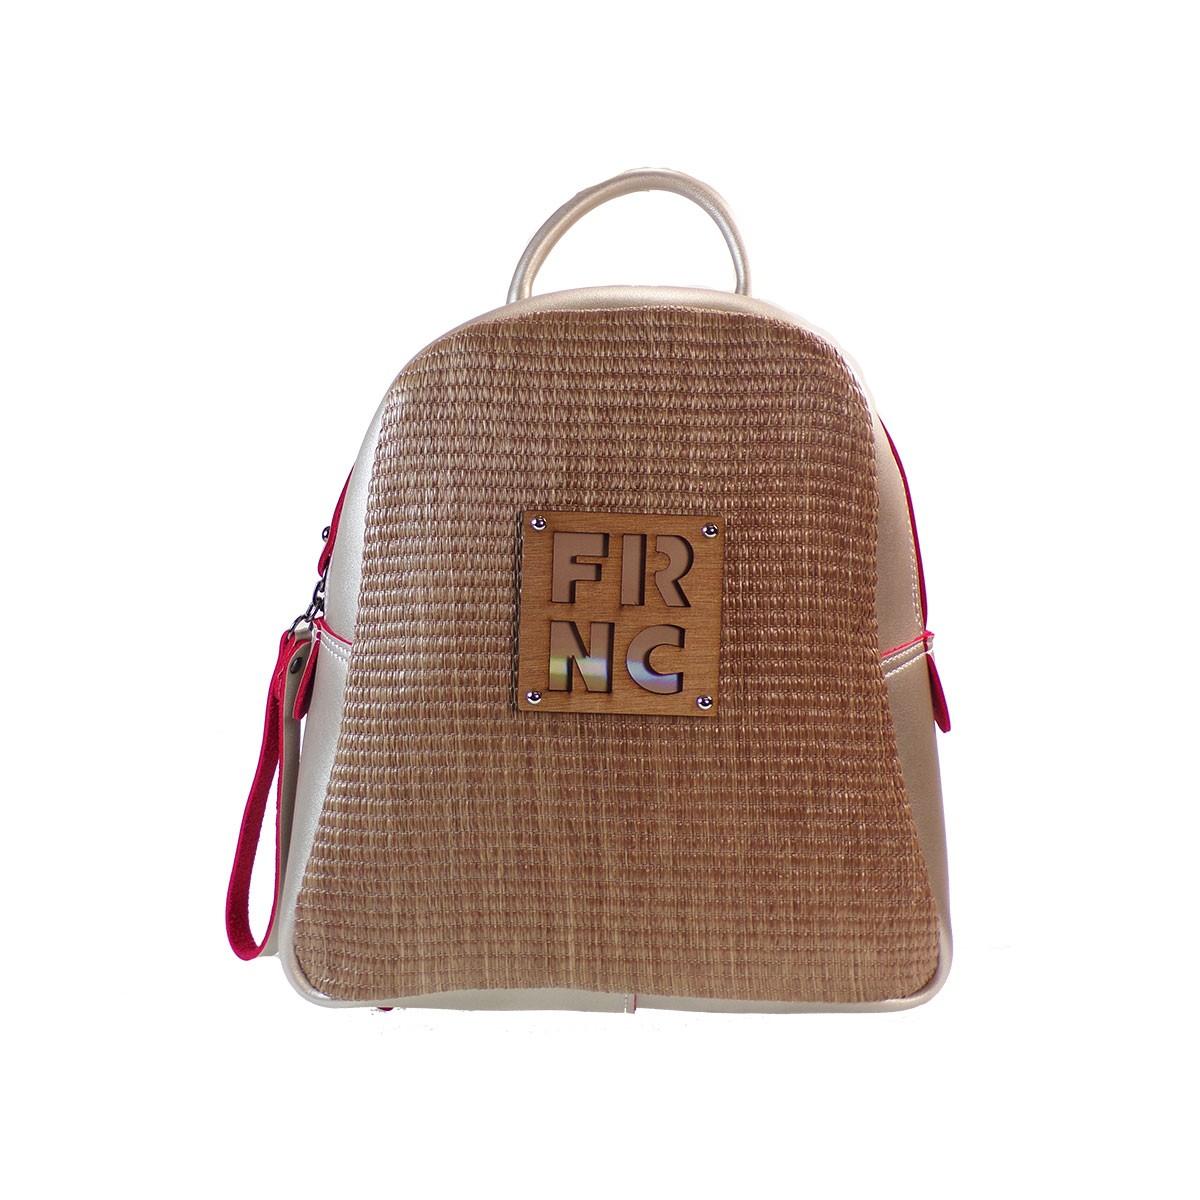 fa8cb7bbb6 FRNC FRANCESCO Τσάντα Γυναικεία Πλάτης-Backpack 1201 Πλατίνα Ψάθα ...